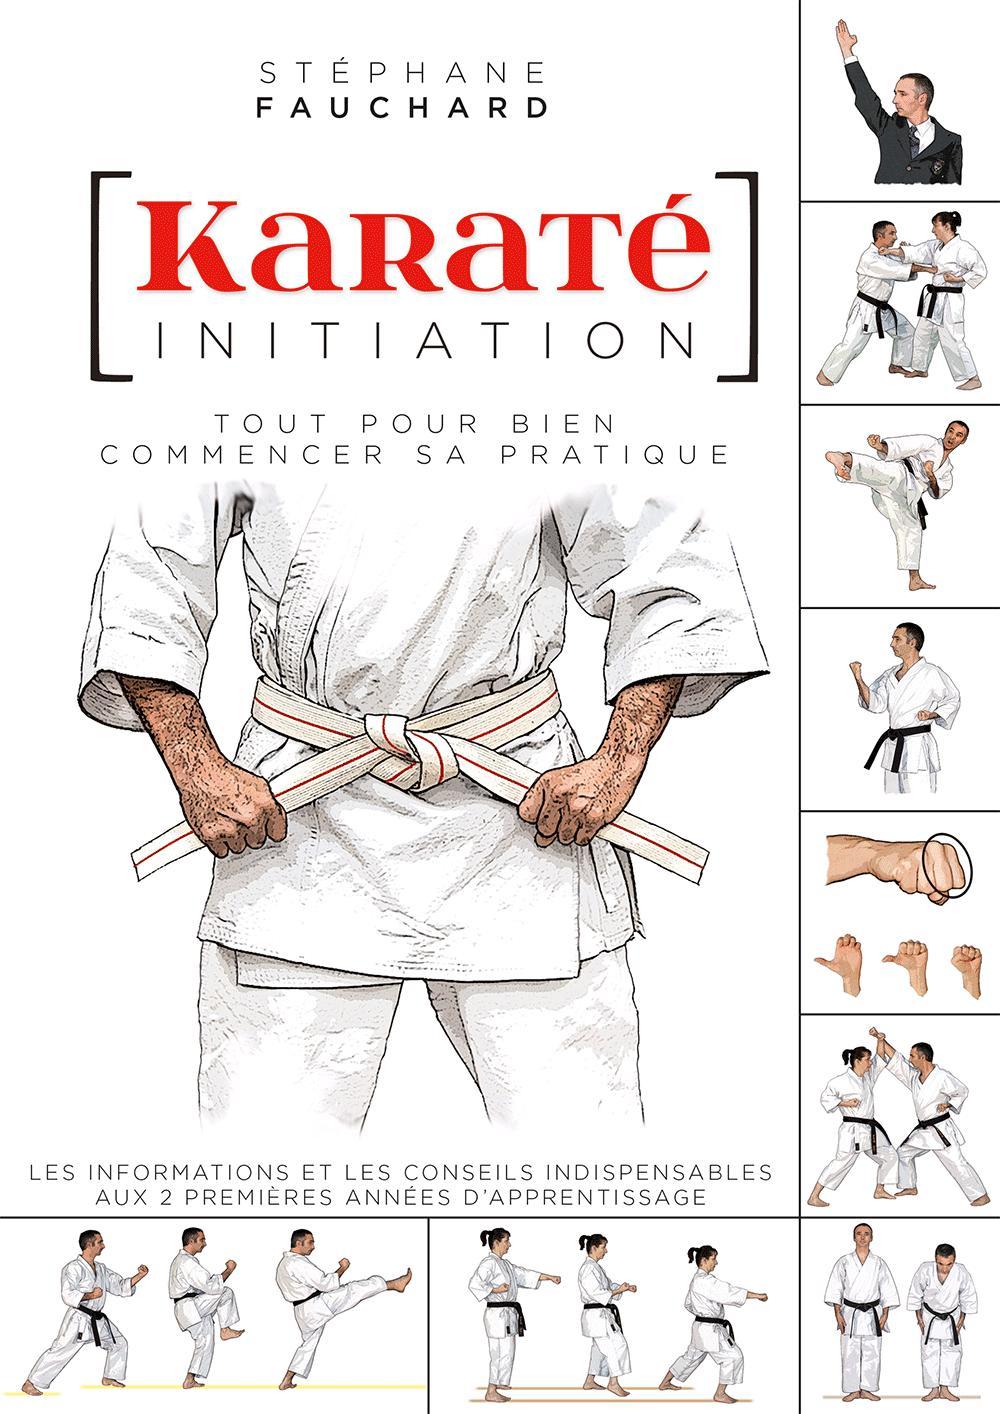 KARATE - INITIATION